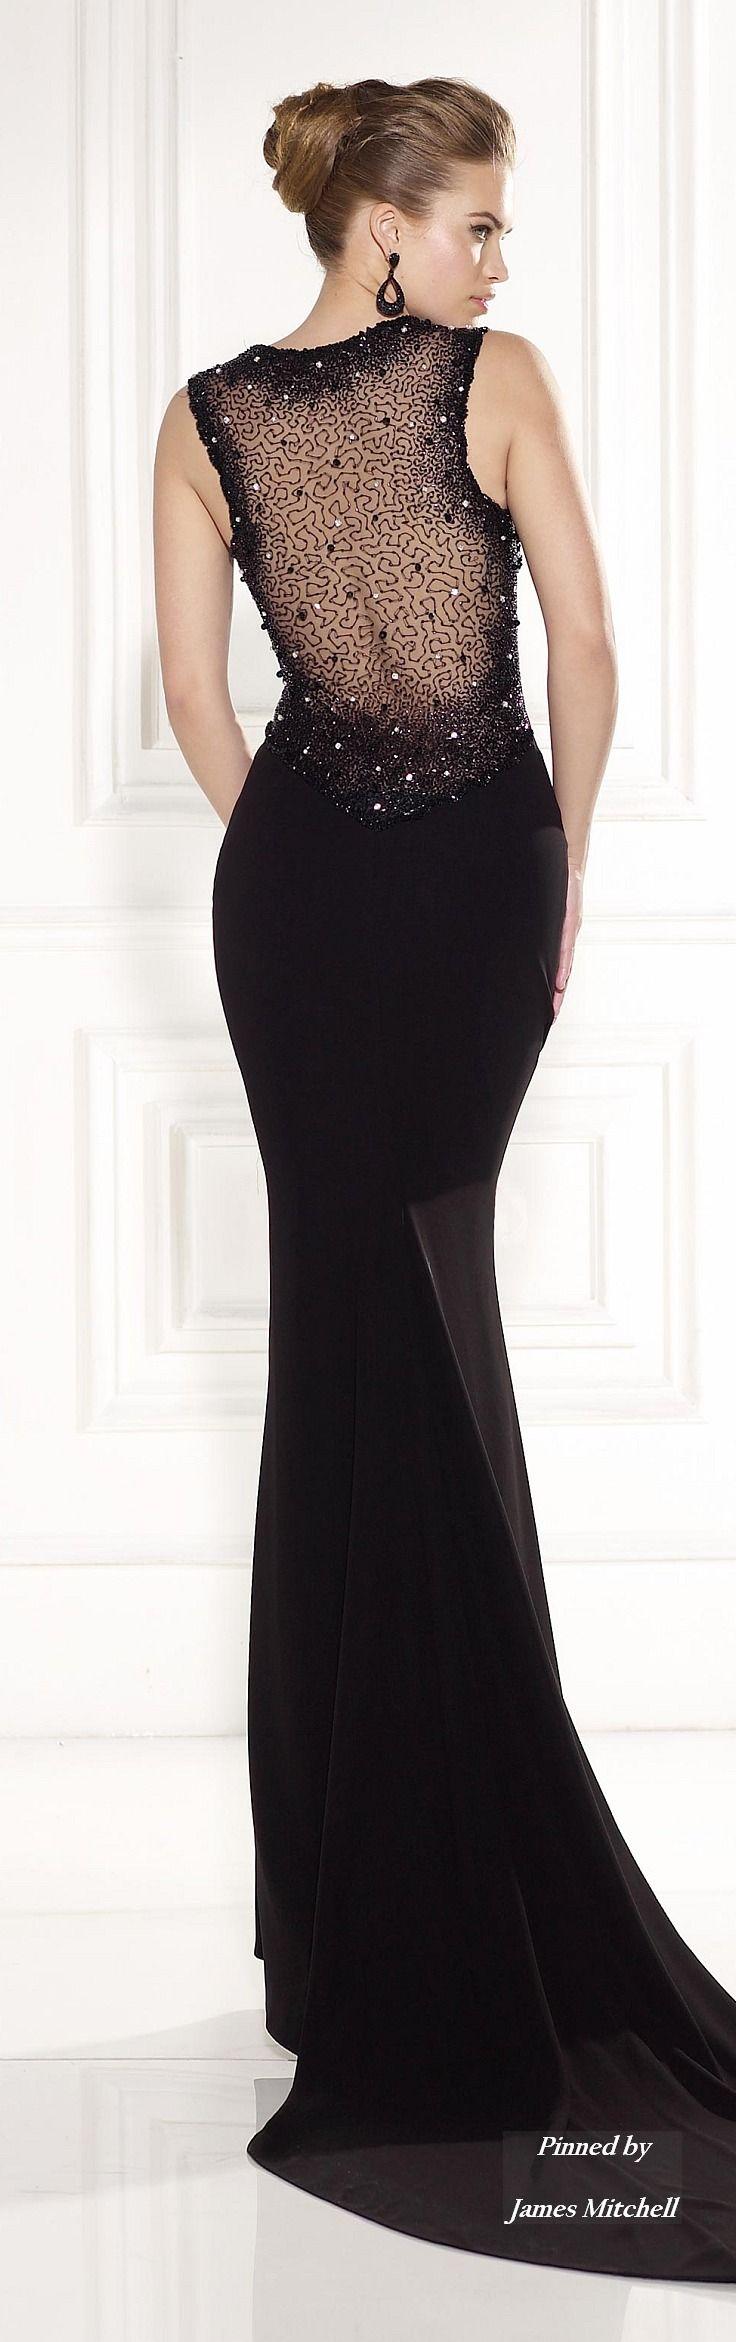 best vestidos de noiva brilhantes images on pinterest ball